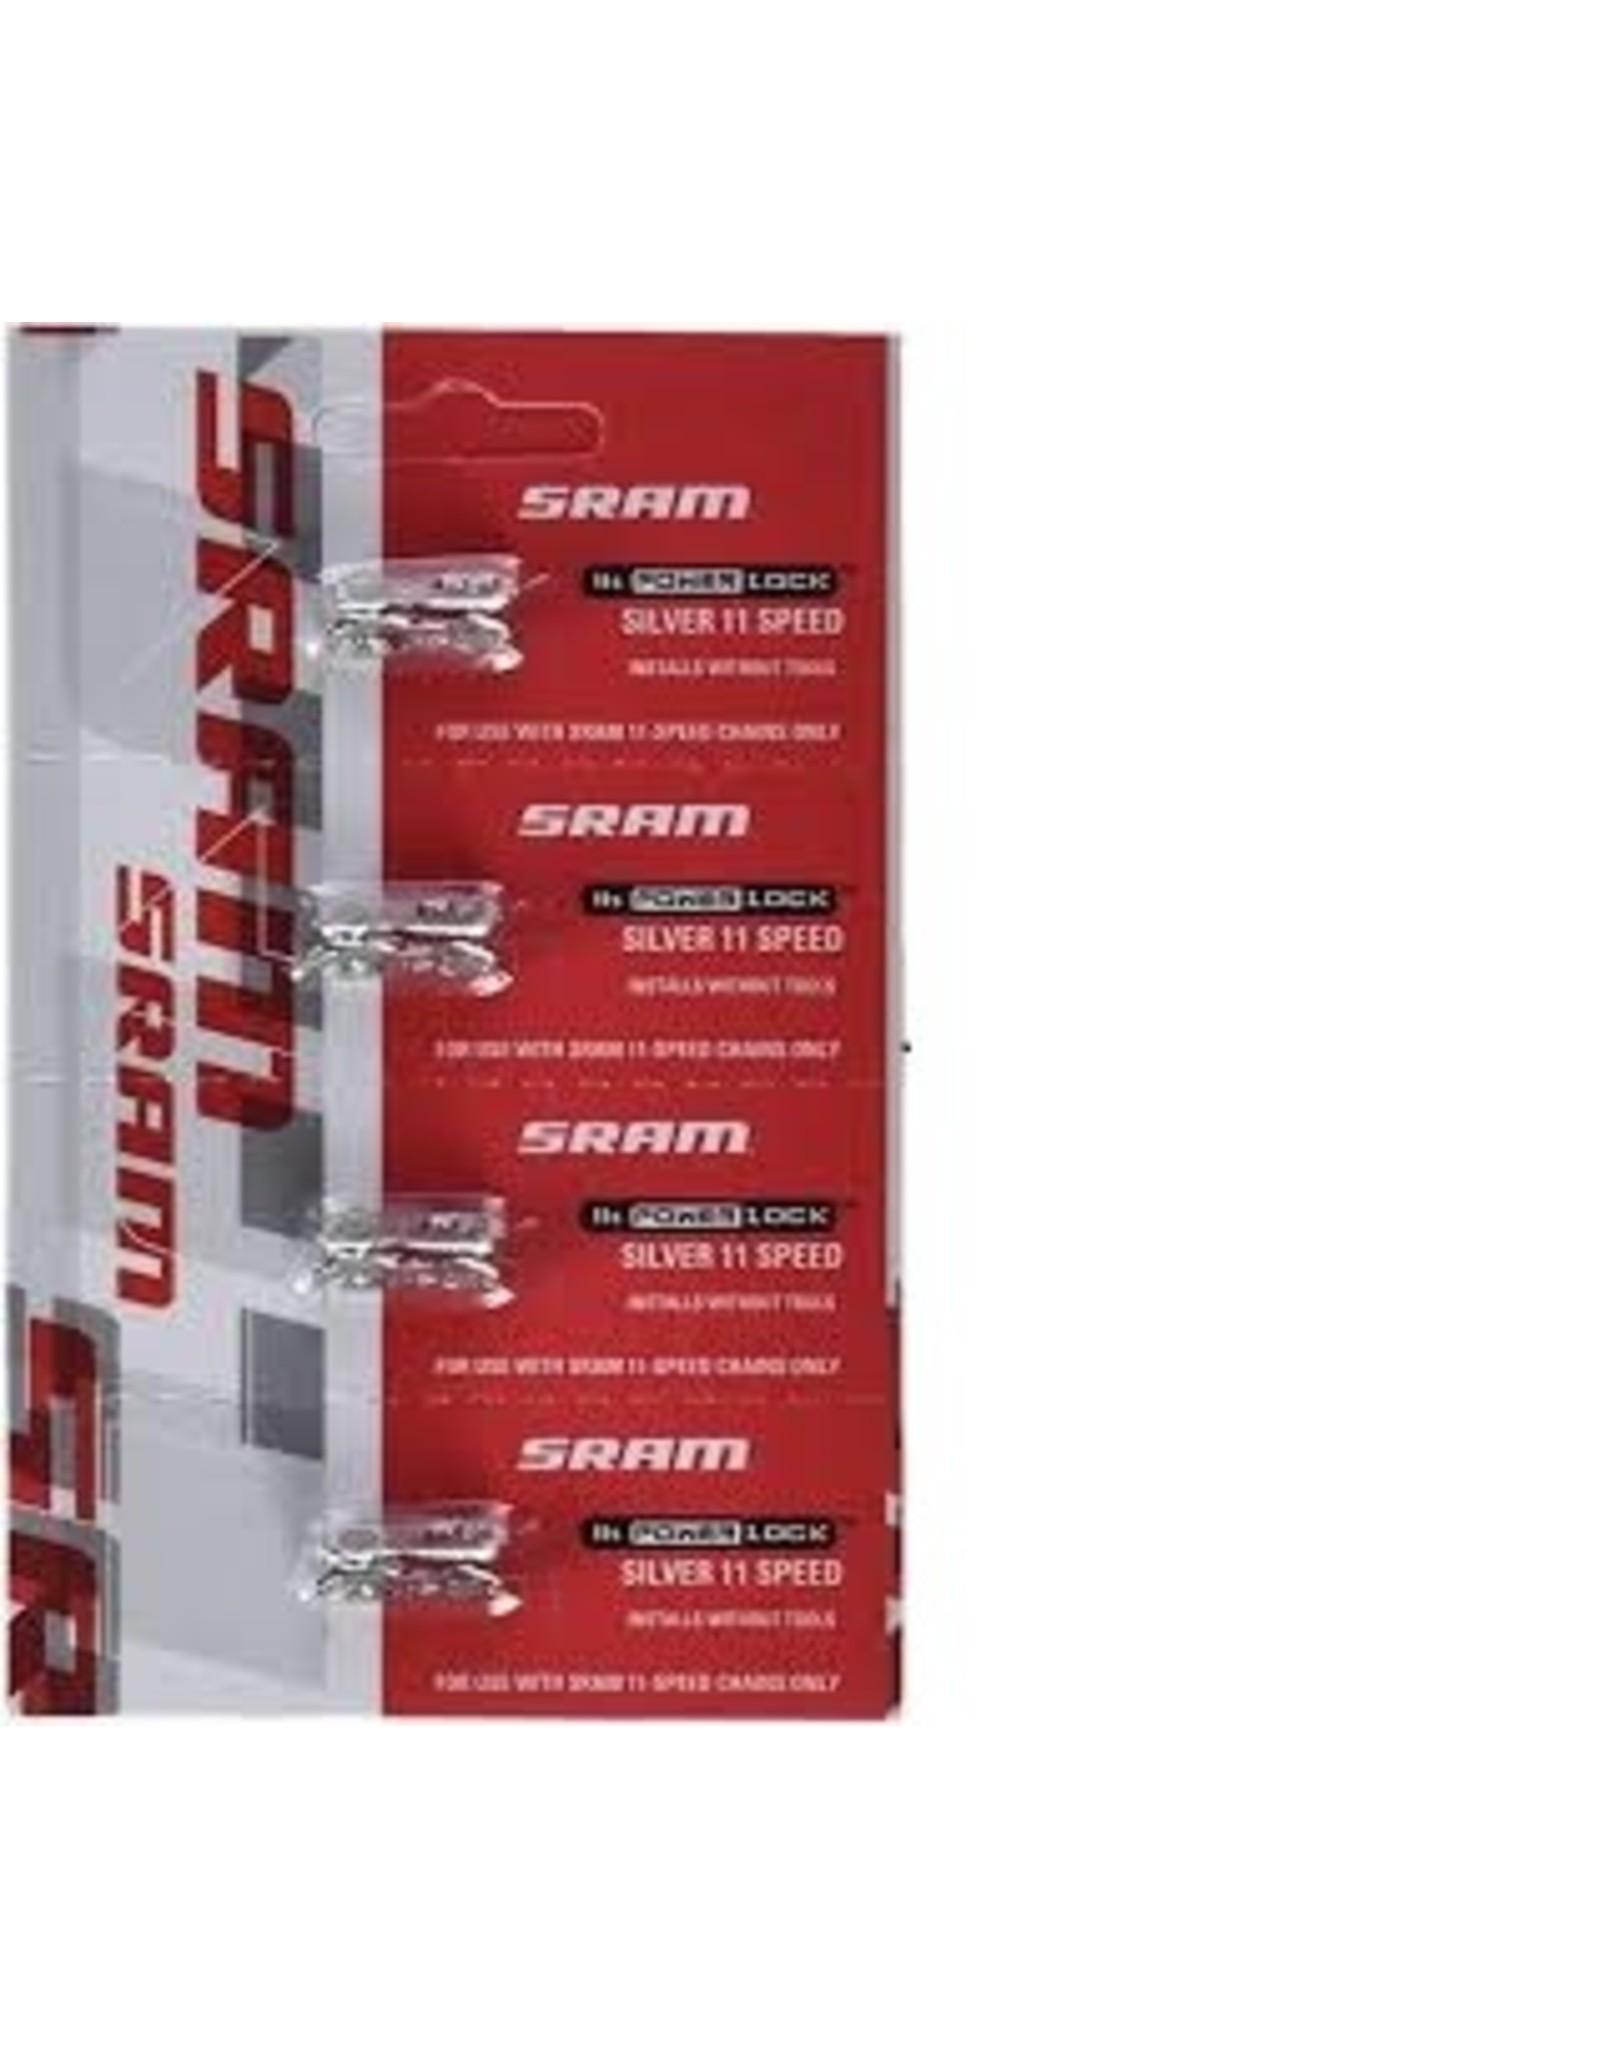 SRAM Chain Sram 12 Speed Missing Link Power Lock 4 Pack